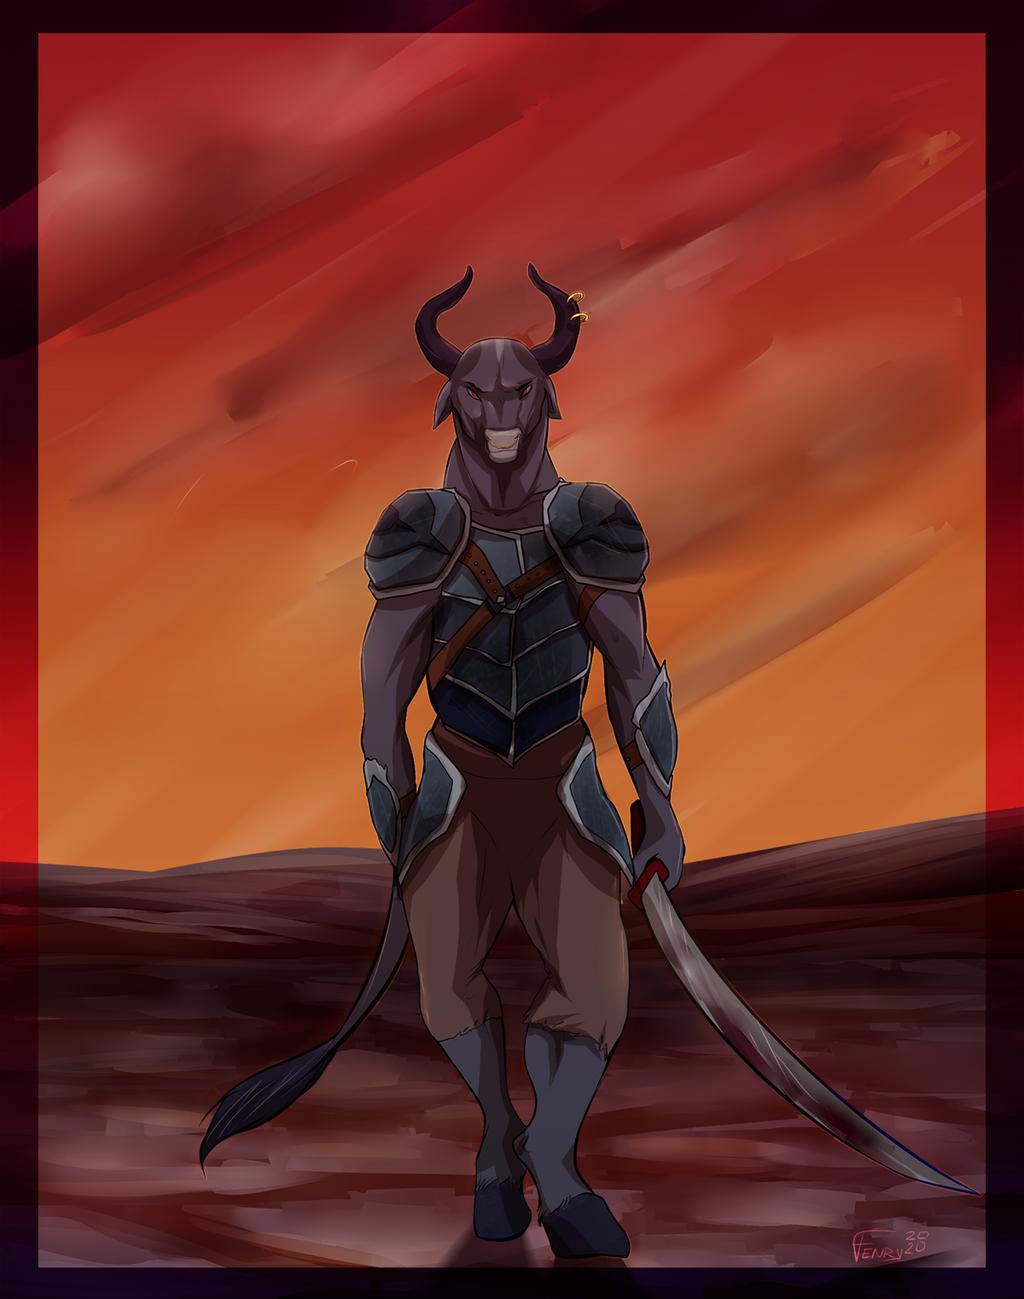 _c__warrior_s_spirit_by_fenrytj_ddoxeb6-fullview.png